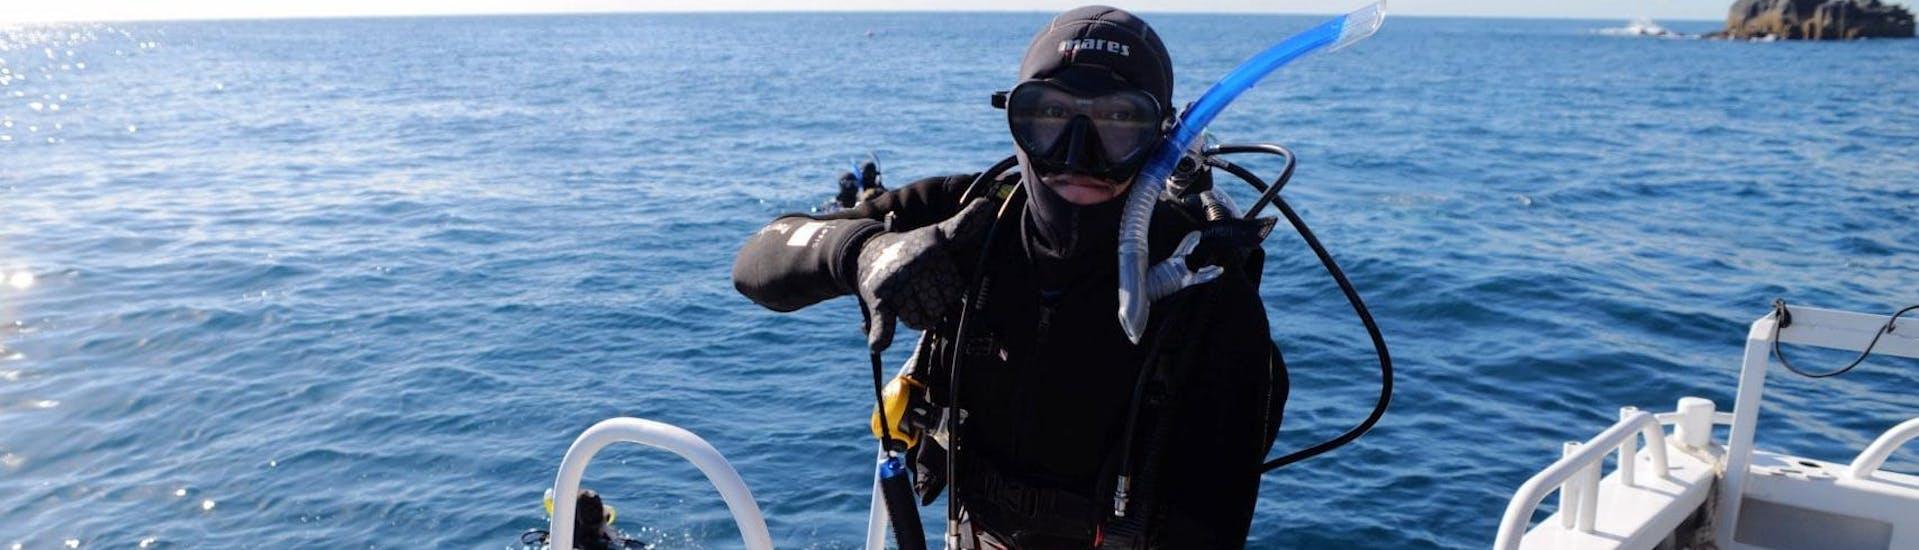 padi-ssi-advanced-open-water-diver-course-on-the-gold-coast-gold-coast-dive-centre-hero1